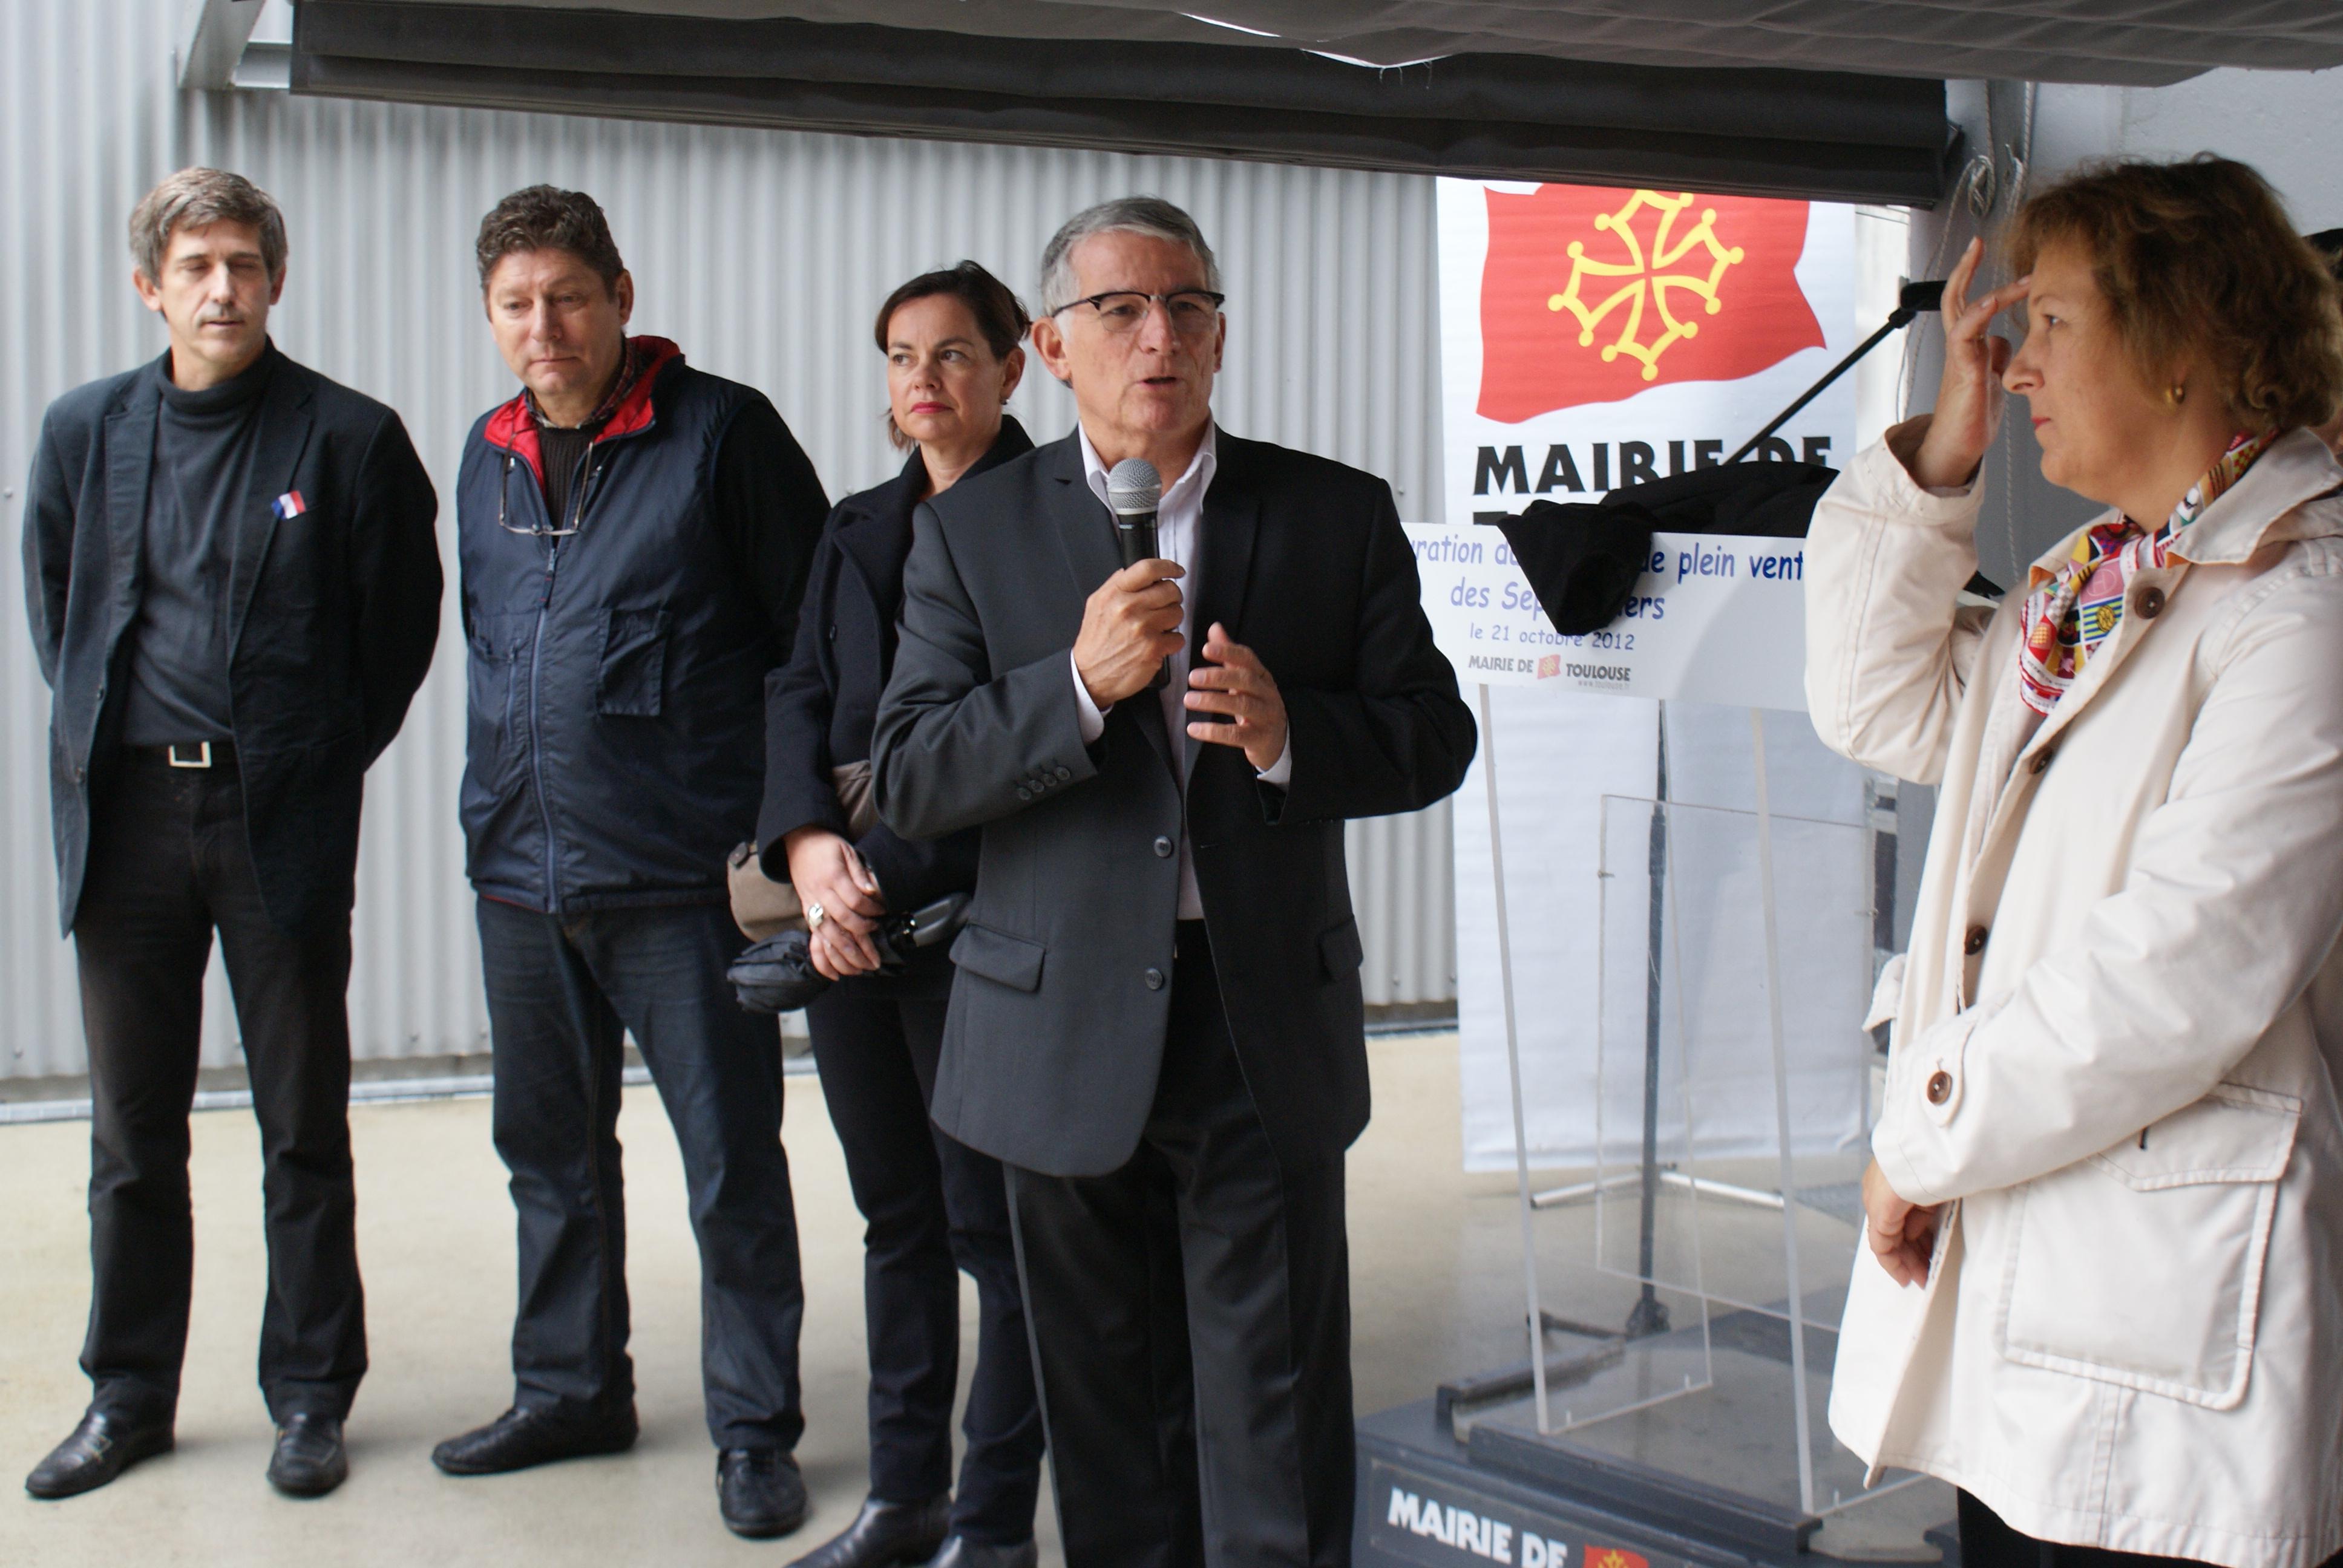 Inauguration marché de plein vent